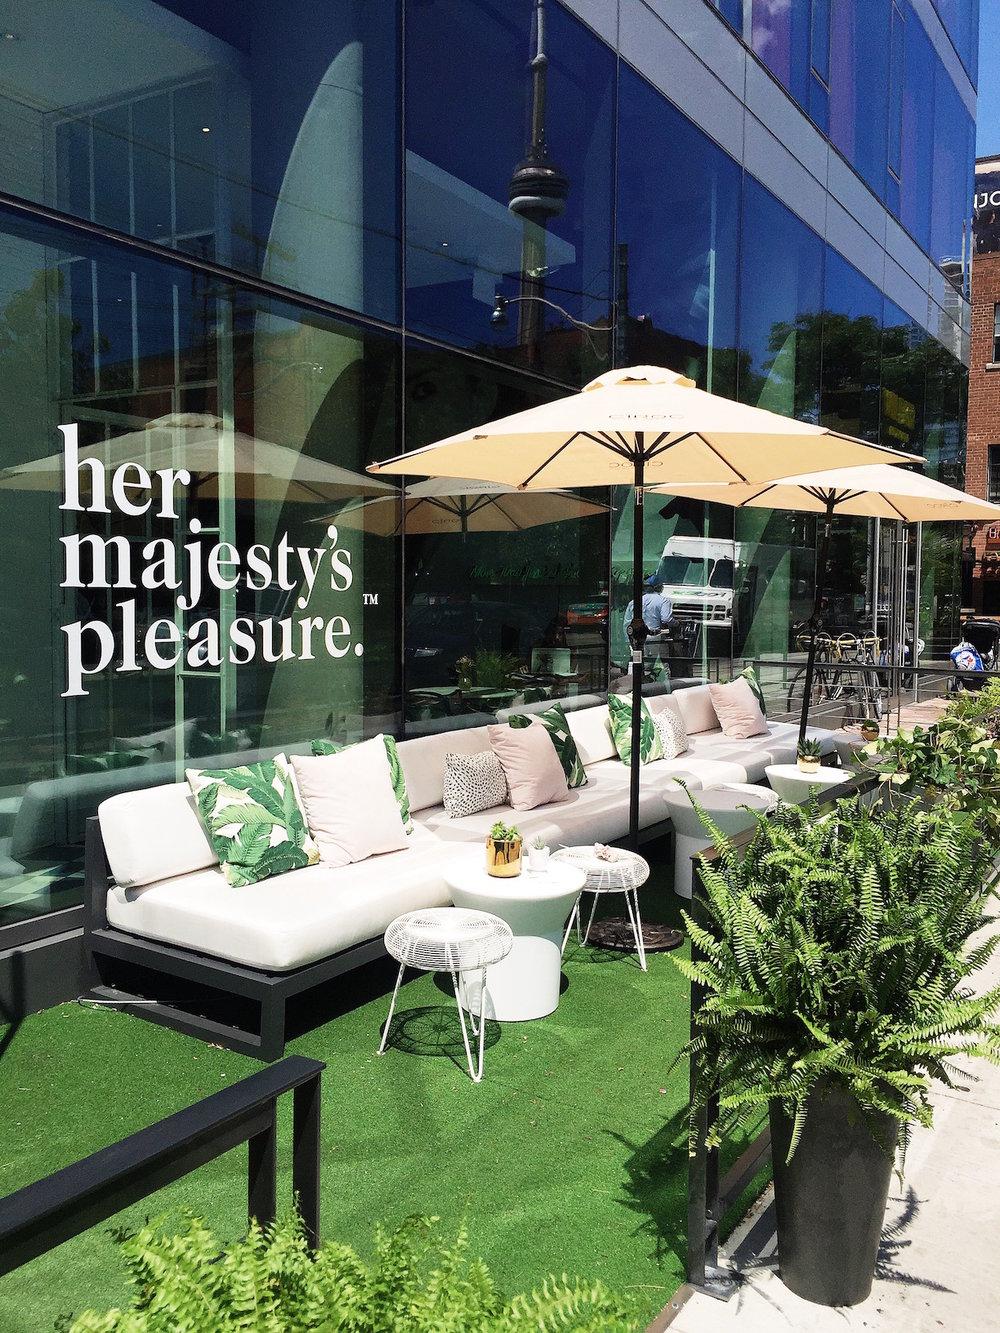 Lisa-Ho-Studio-Her-Majesty's-Pleasure-patio-design.JPG